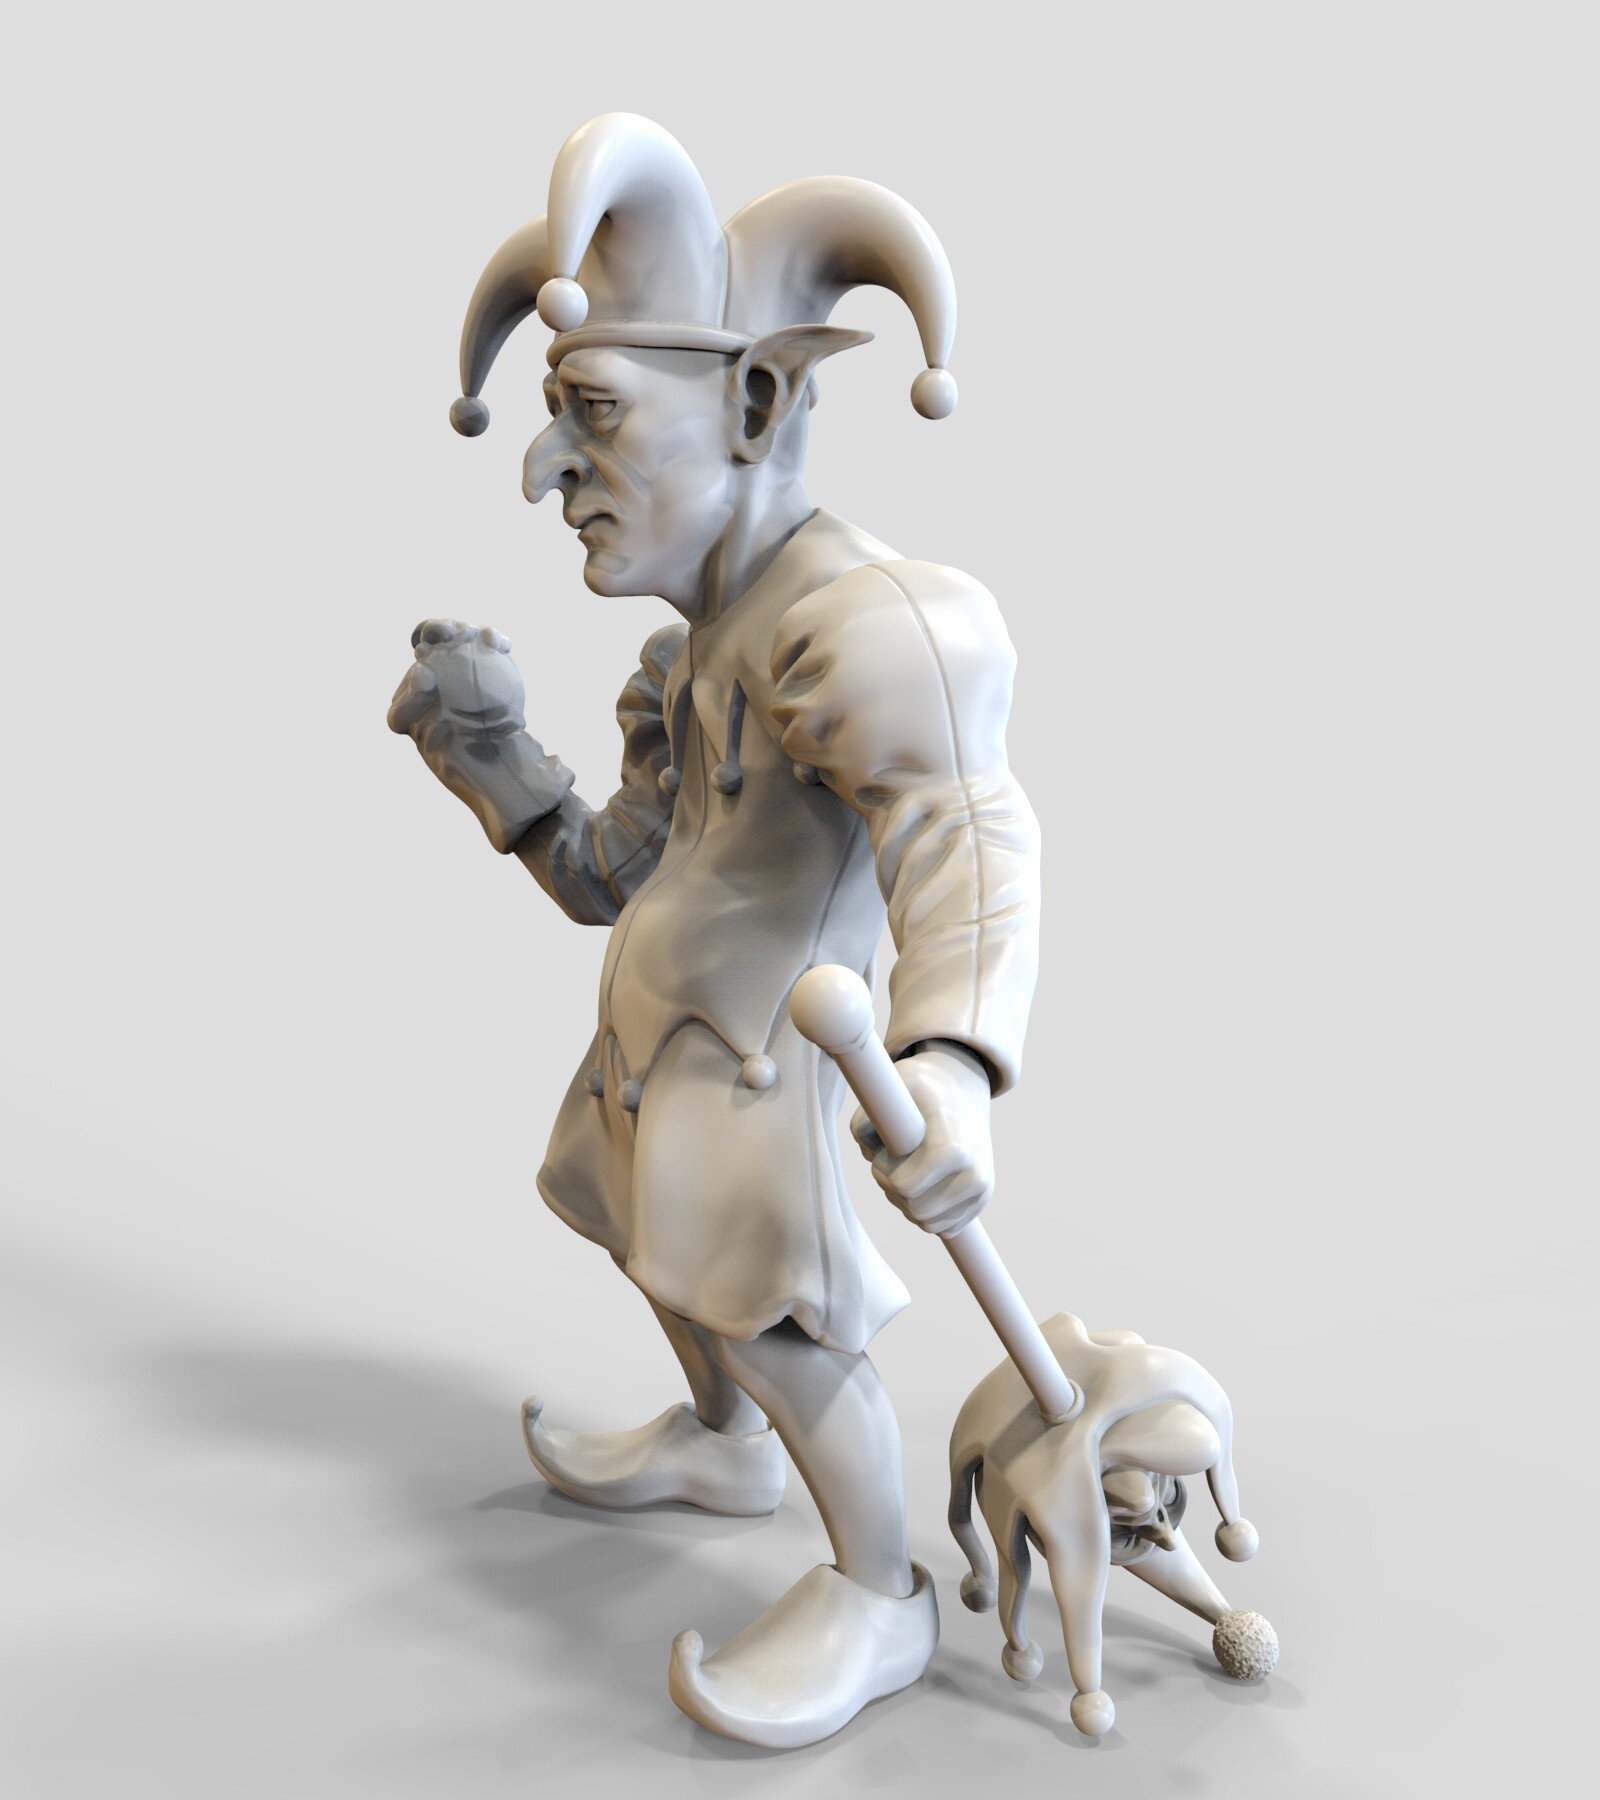 Andre de souza goblin jester 3